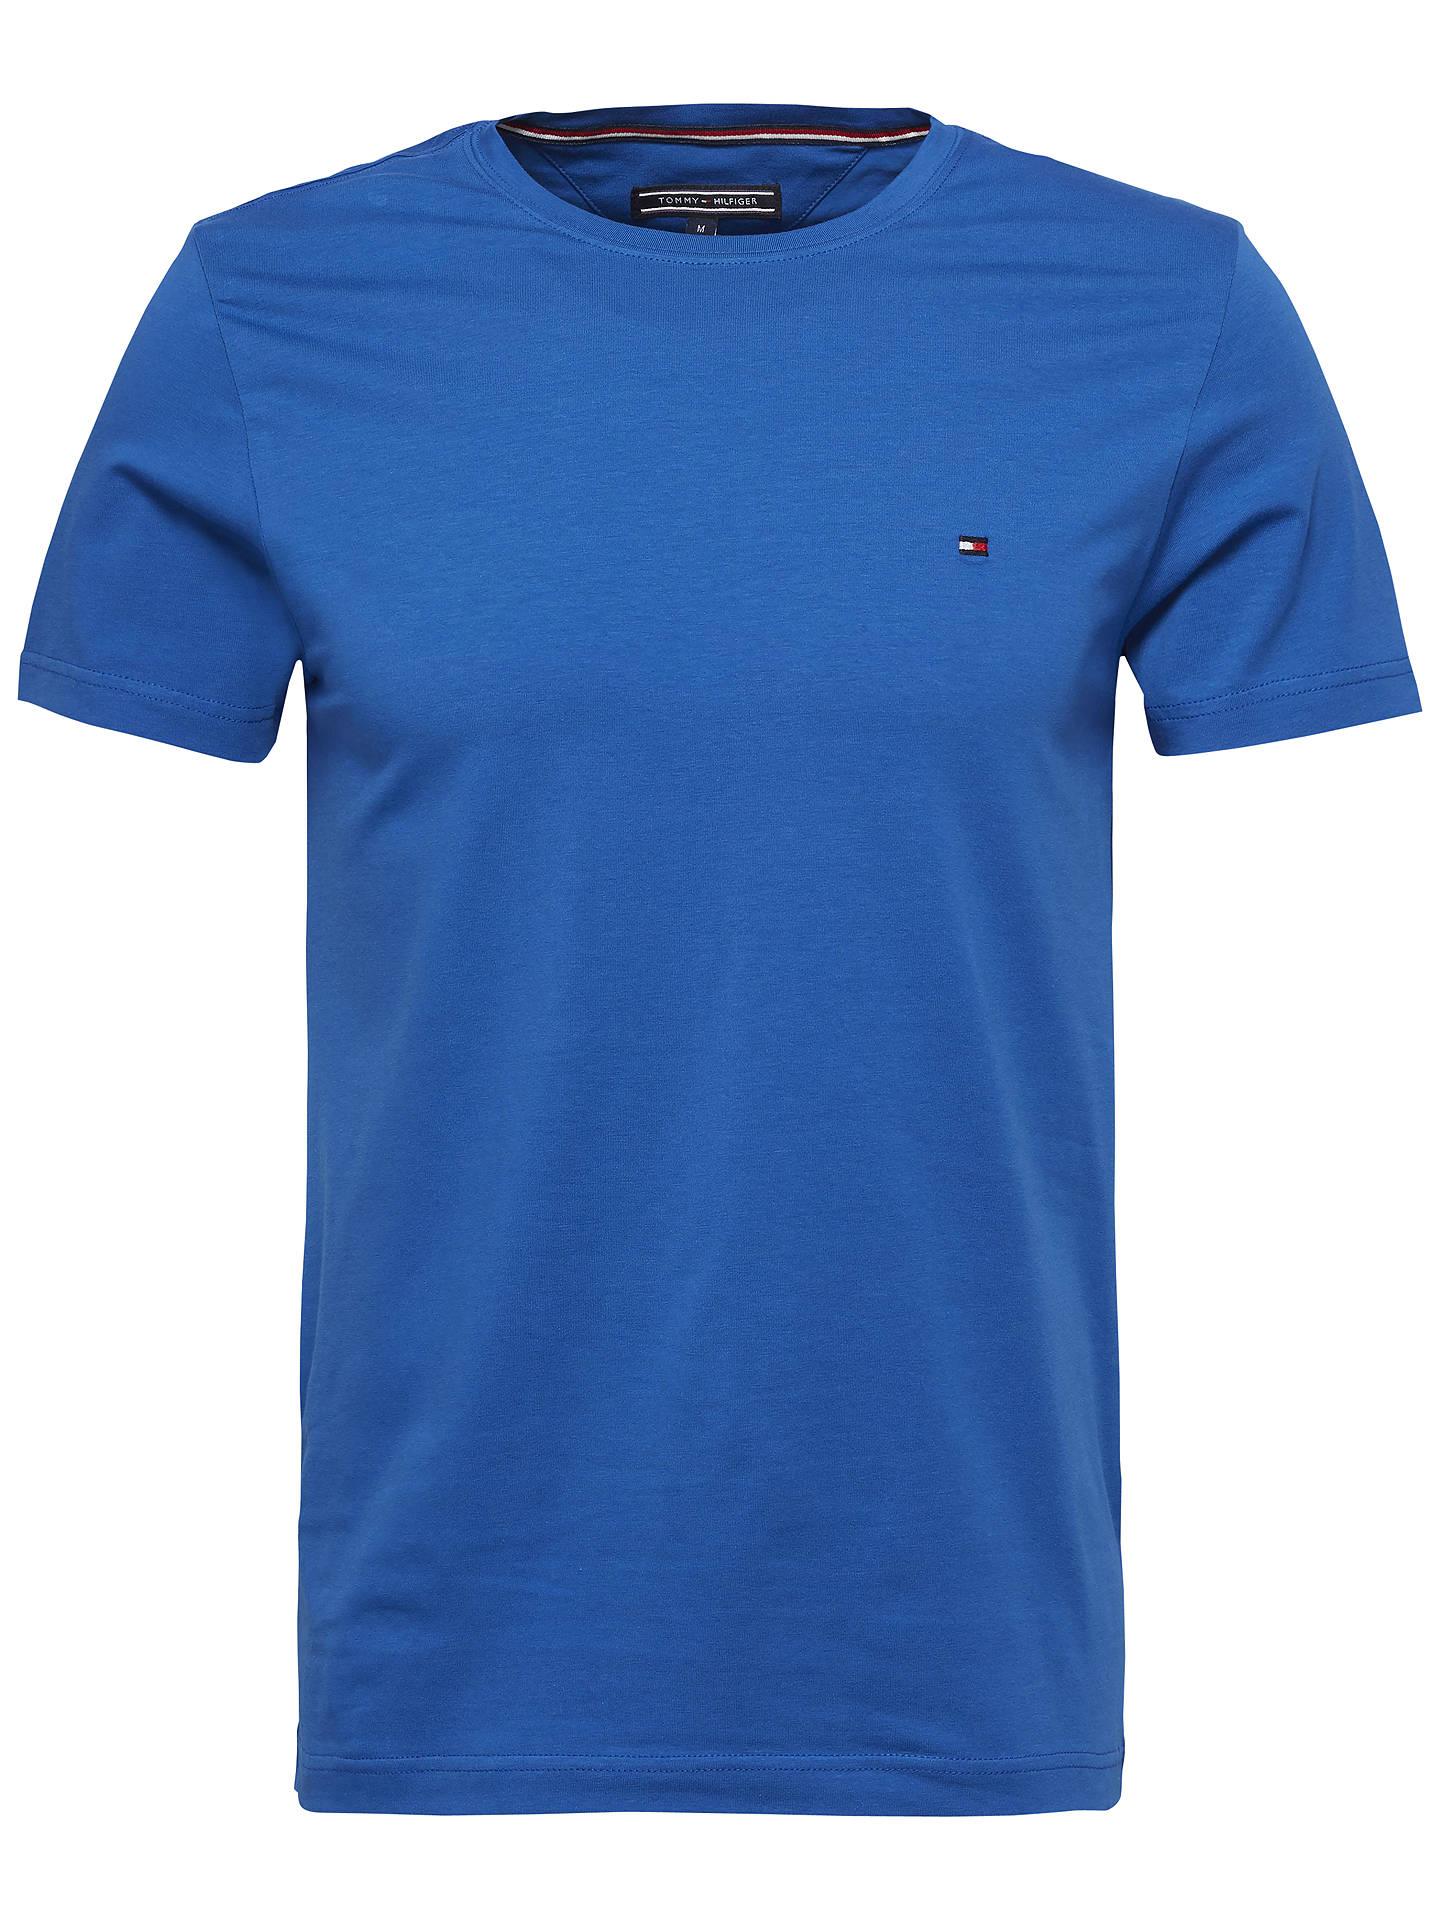 Tommy Hilfiger Mens Nautical Blue Cotton Linen Shirt